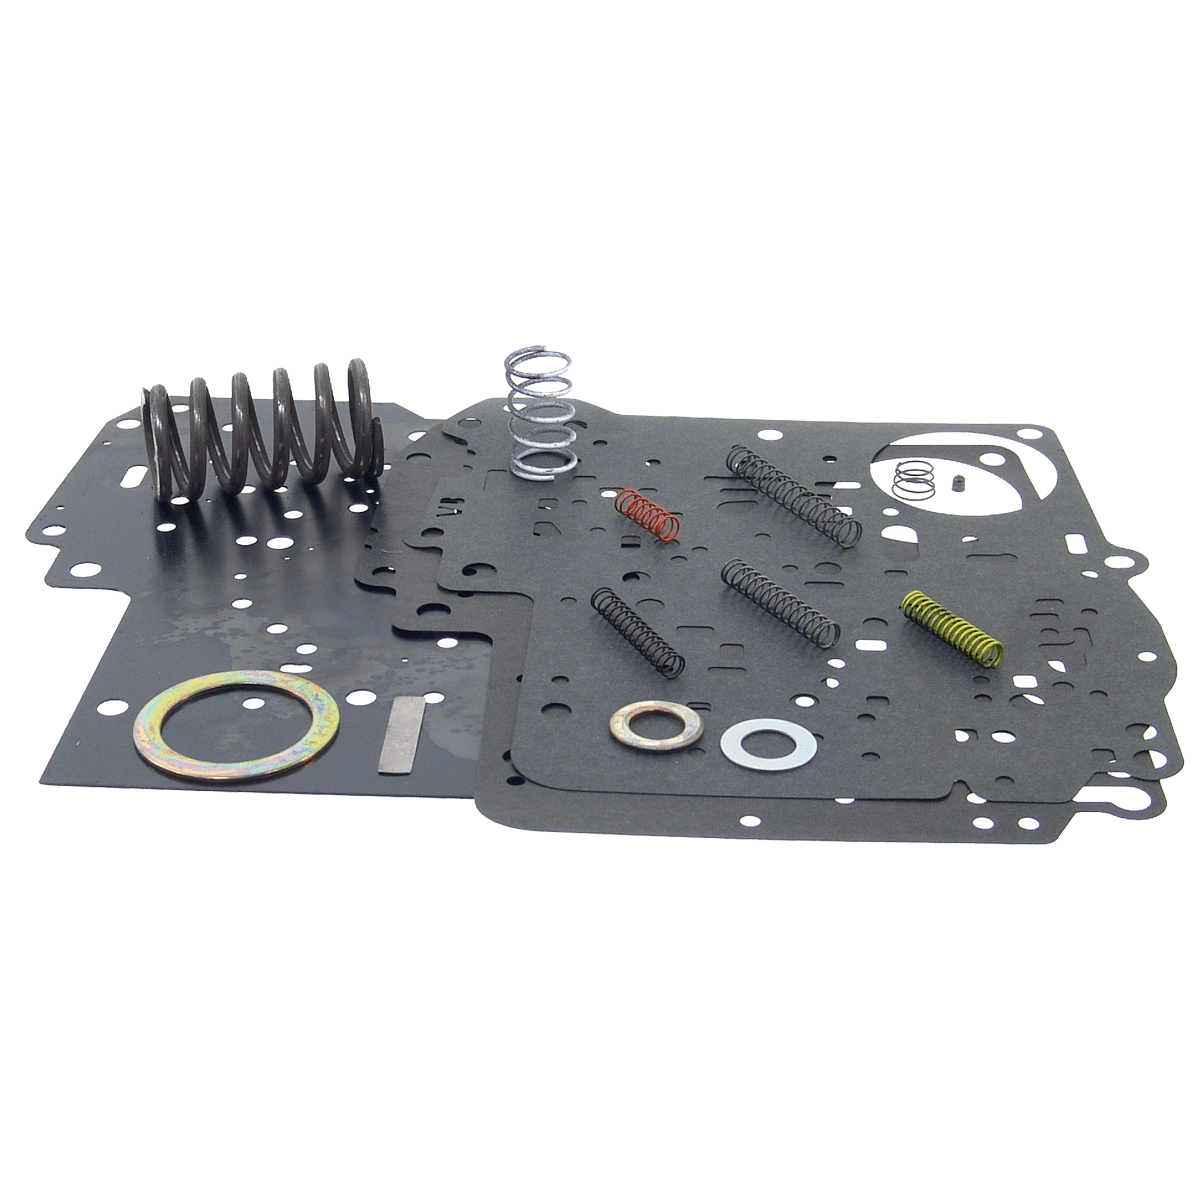 GM 325 SHIFT KIT® Valve Body Repair Kit